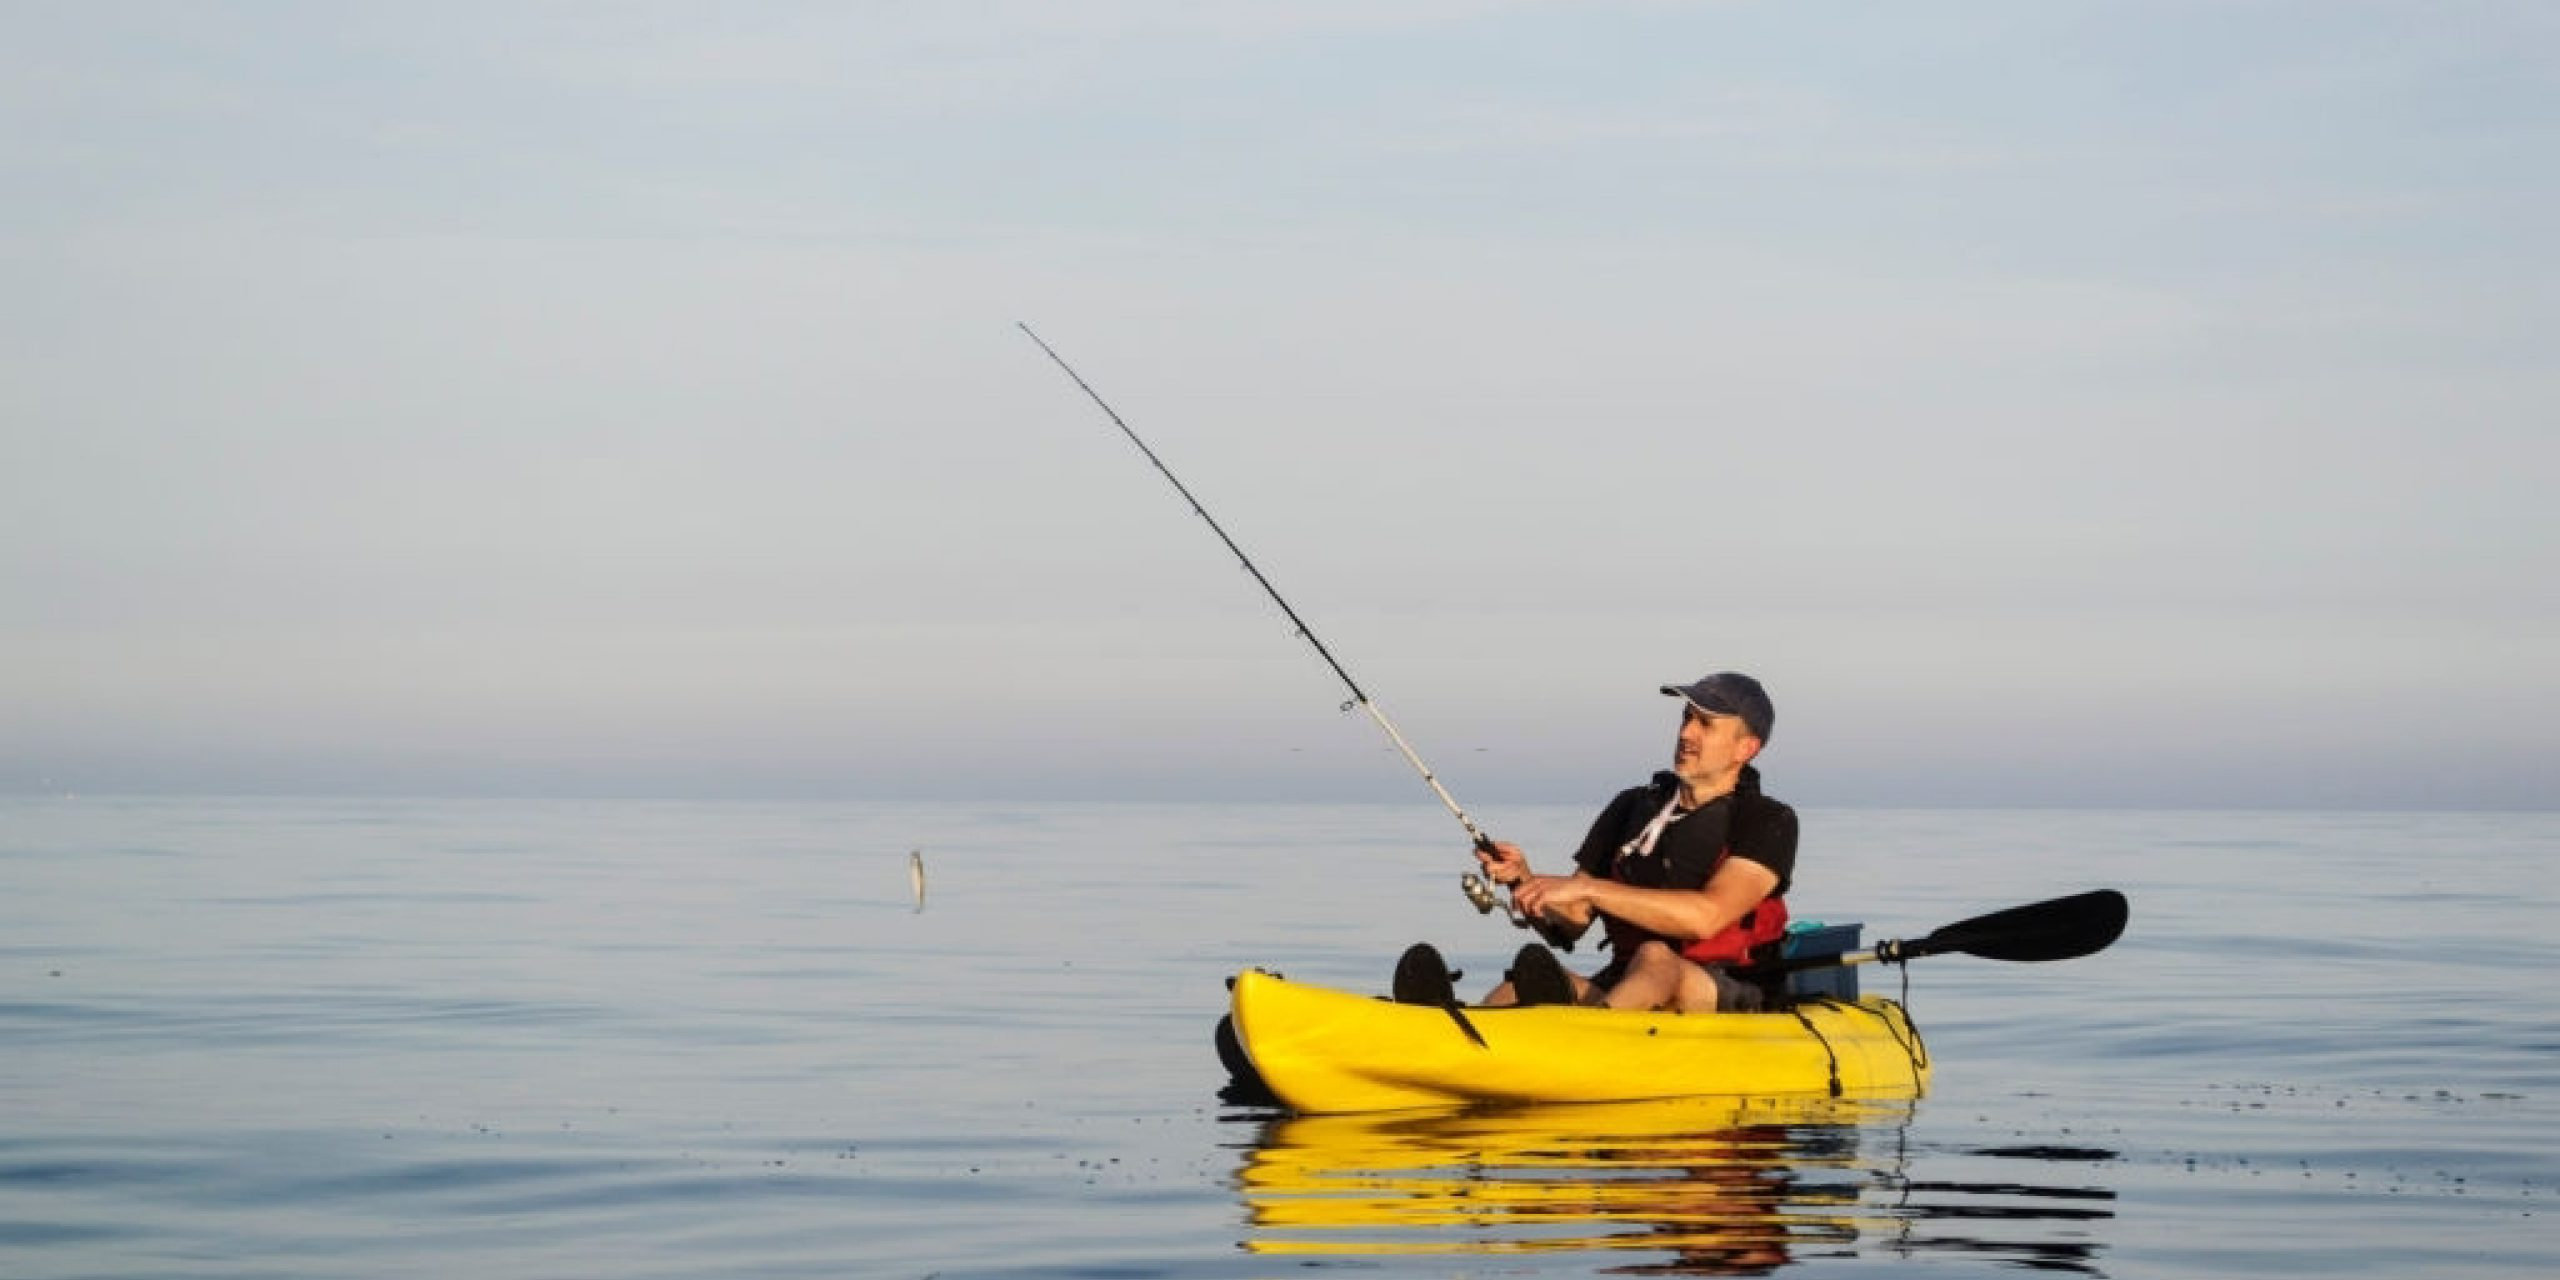 Best Fishing Kayaks Under $1000 In 2021